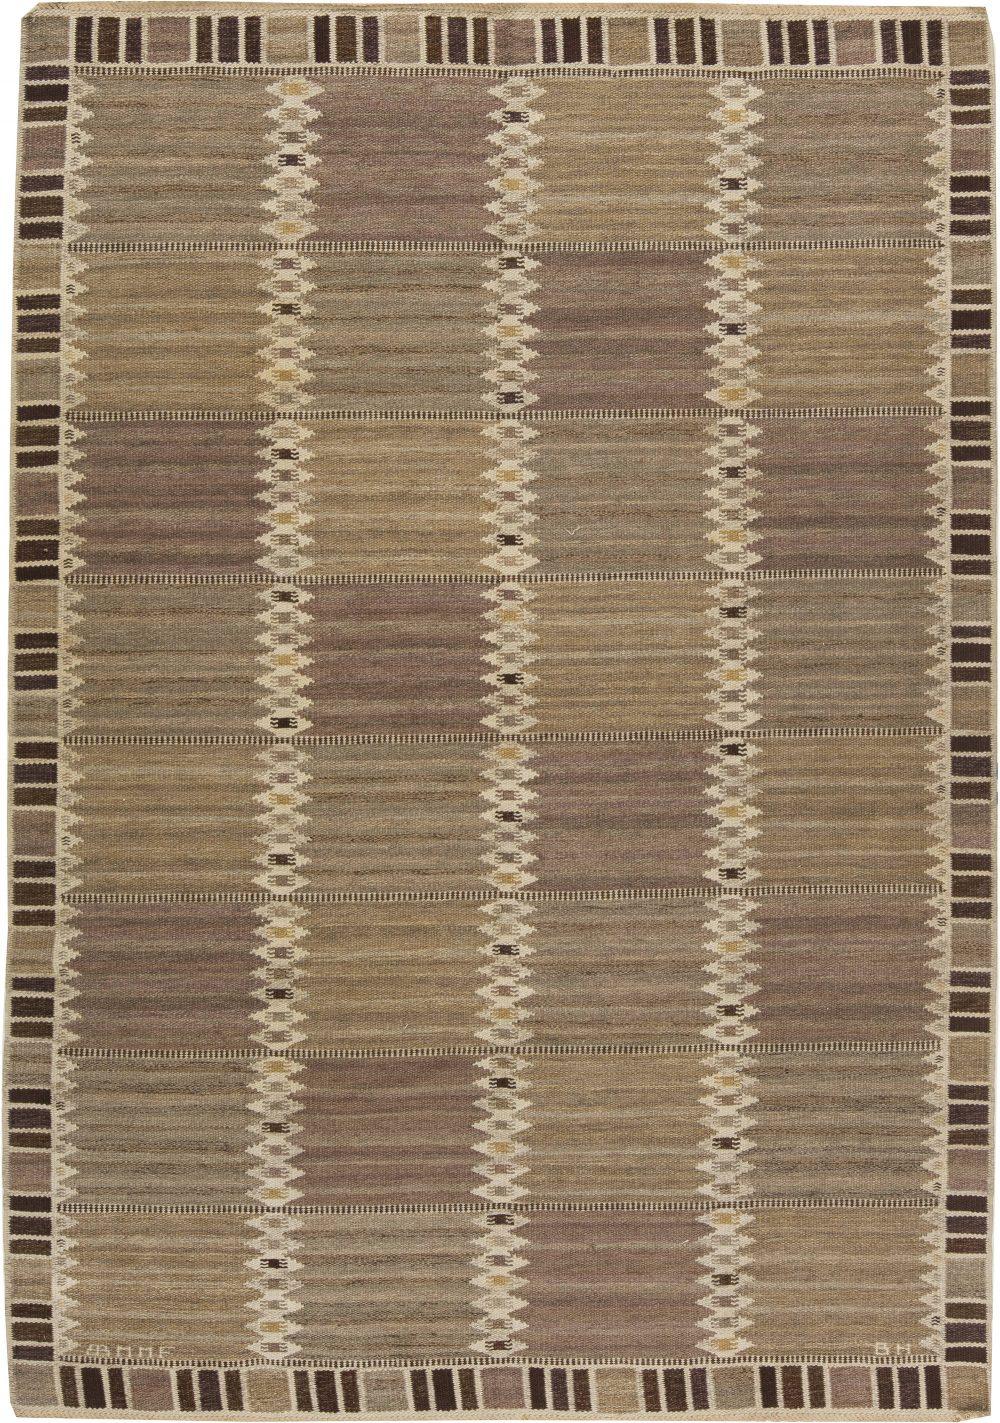 Vintage Swedish Flat Weave Rug by Marta Maas-Fjetterstrom BB6292